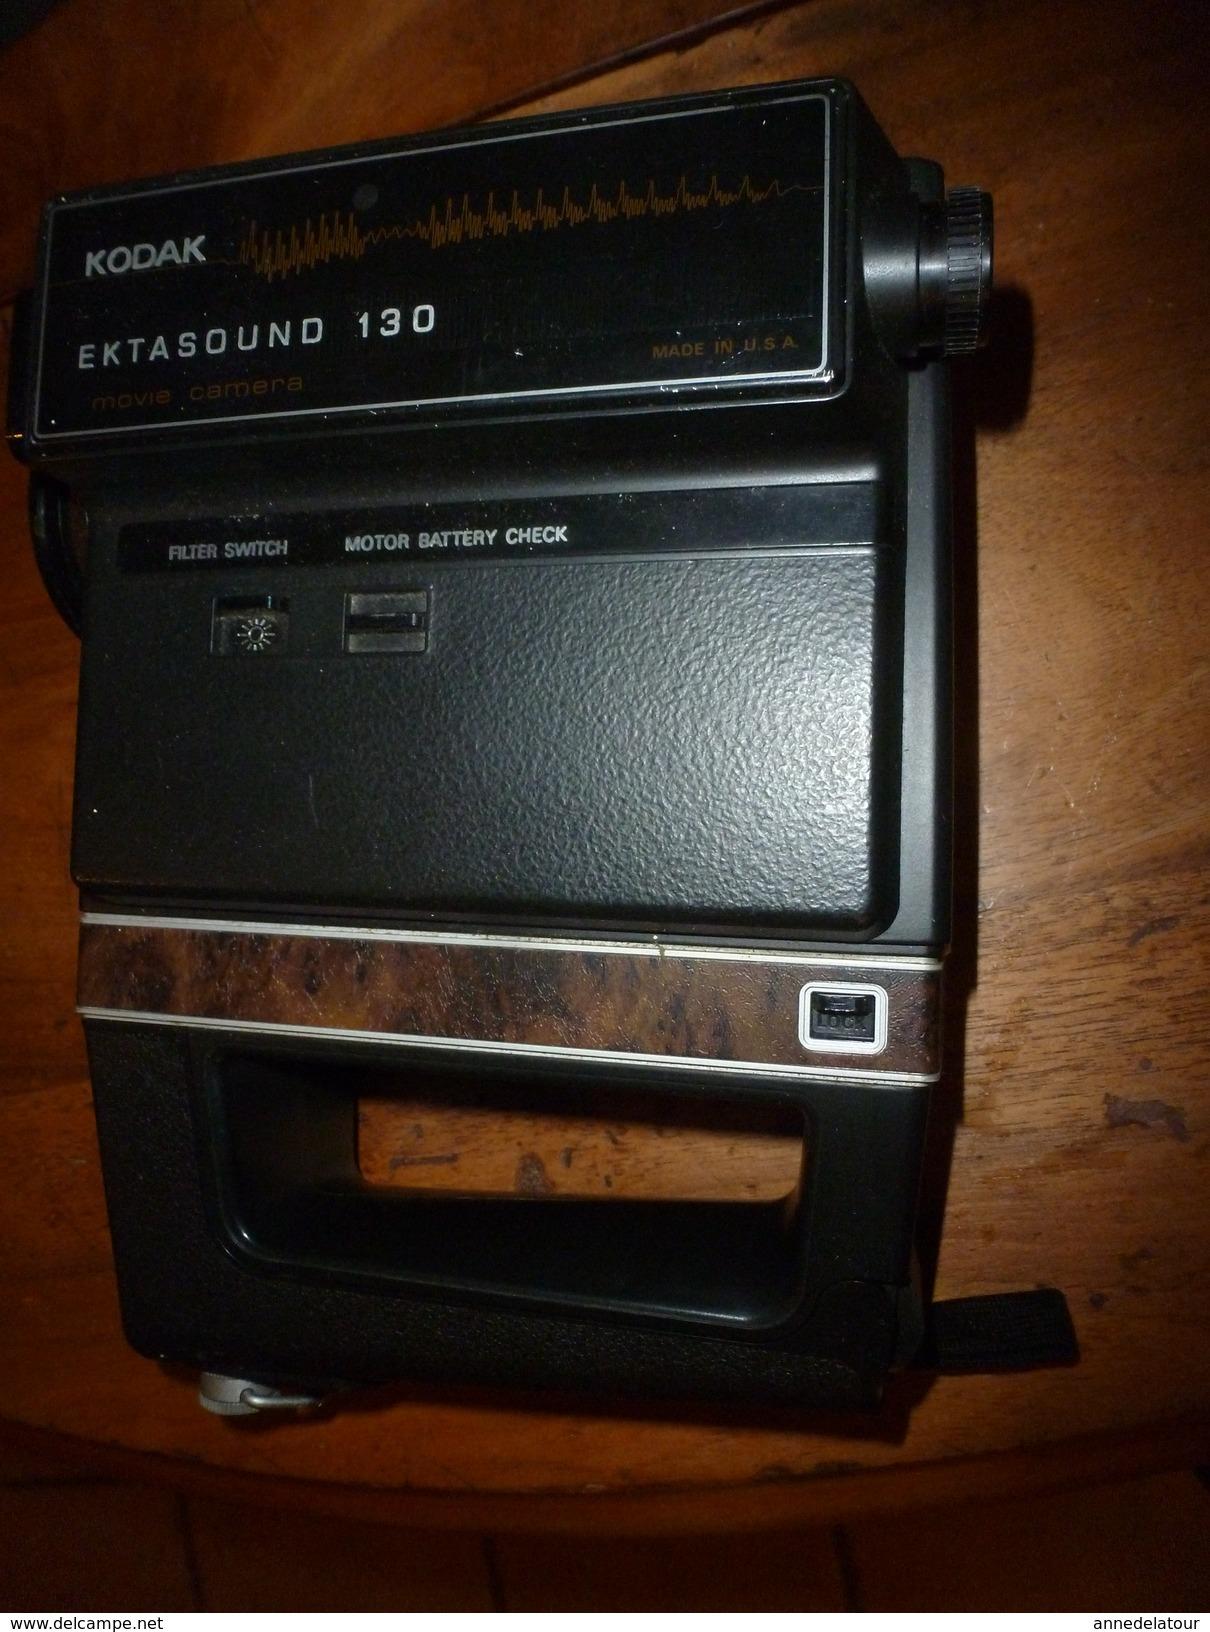 KODAK EKTASOUND 130 Movie Caméra :  Avec Notice Et Boite D'origine  (année De Fabrication Probable, Vers 1973) - Camcorder